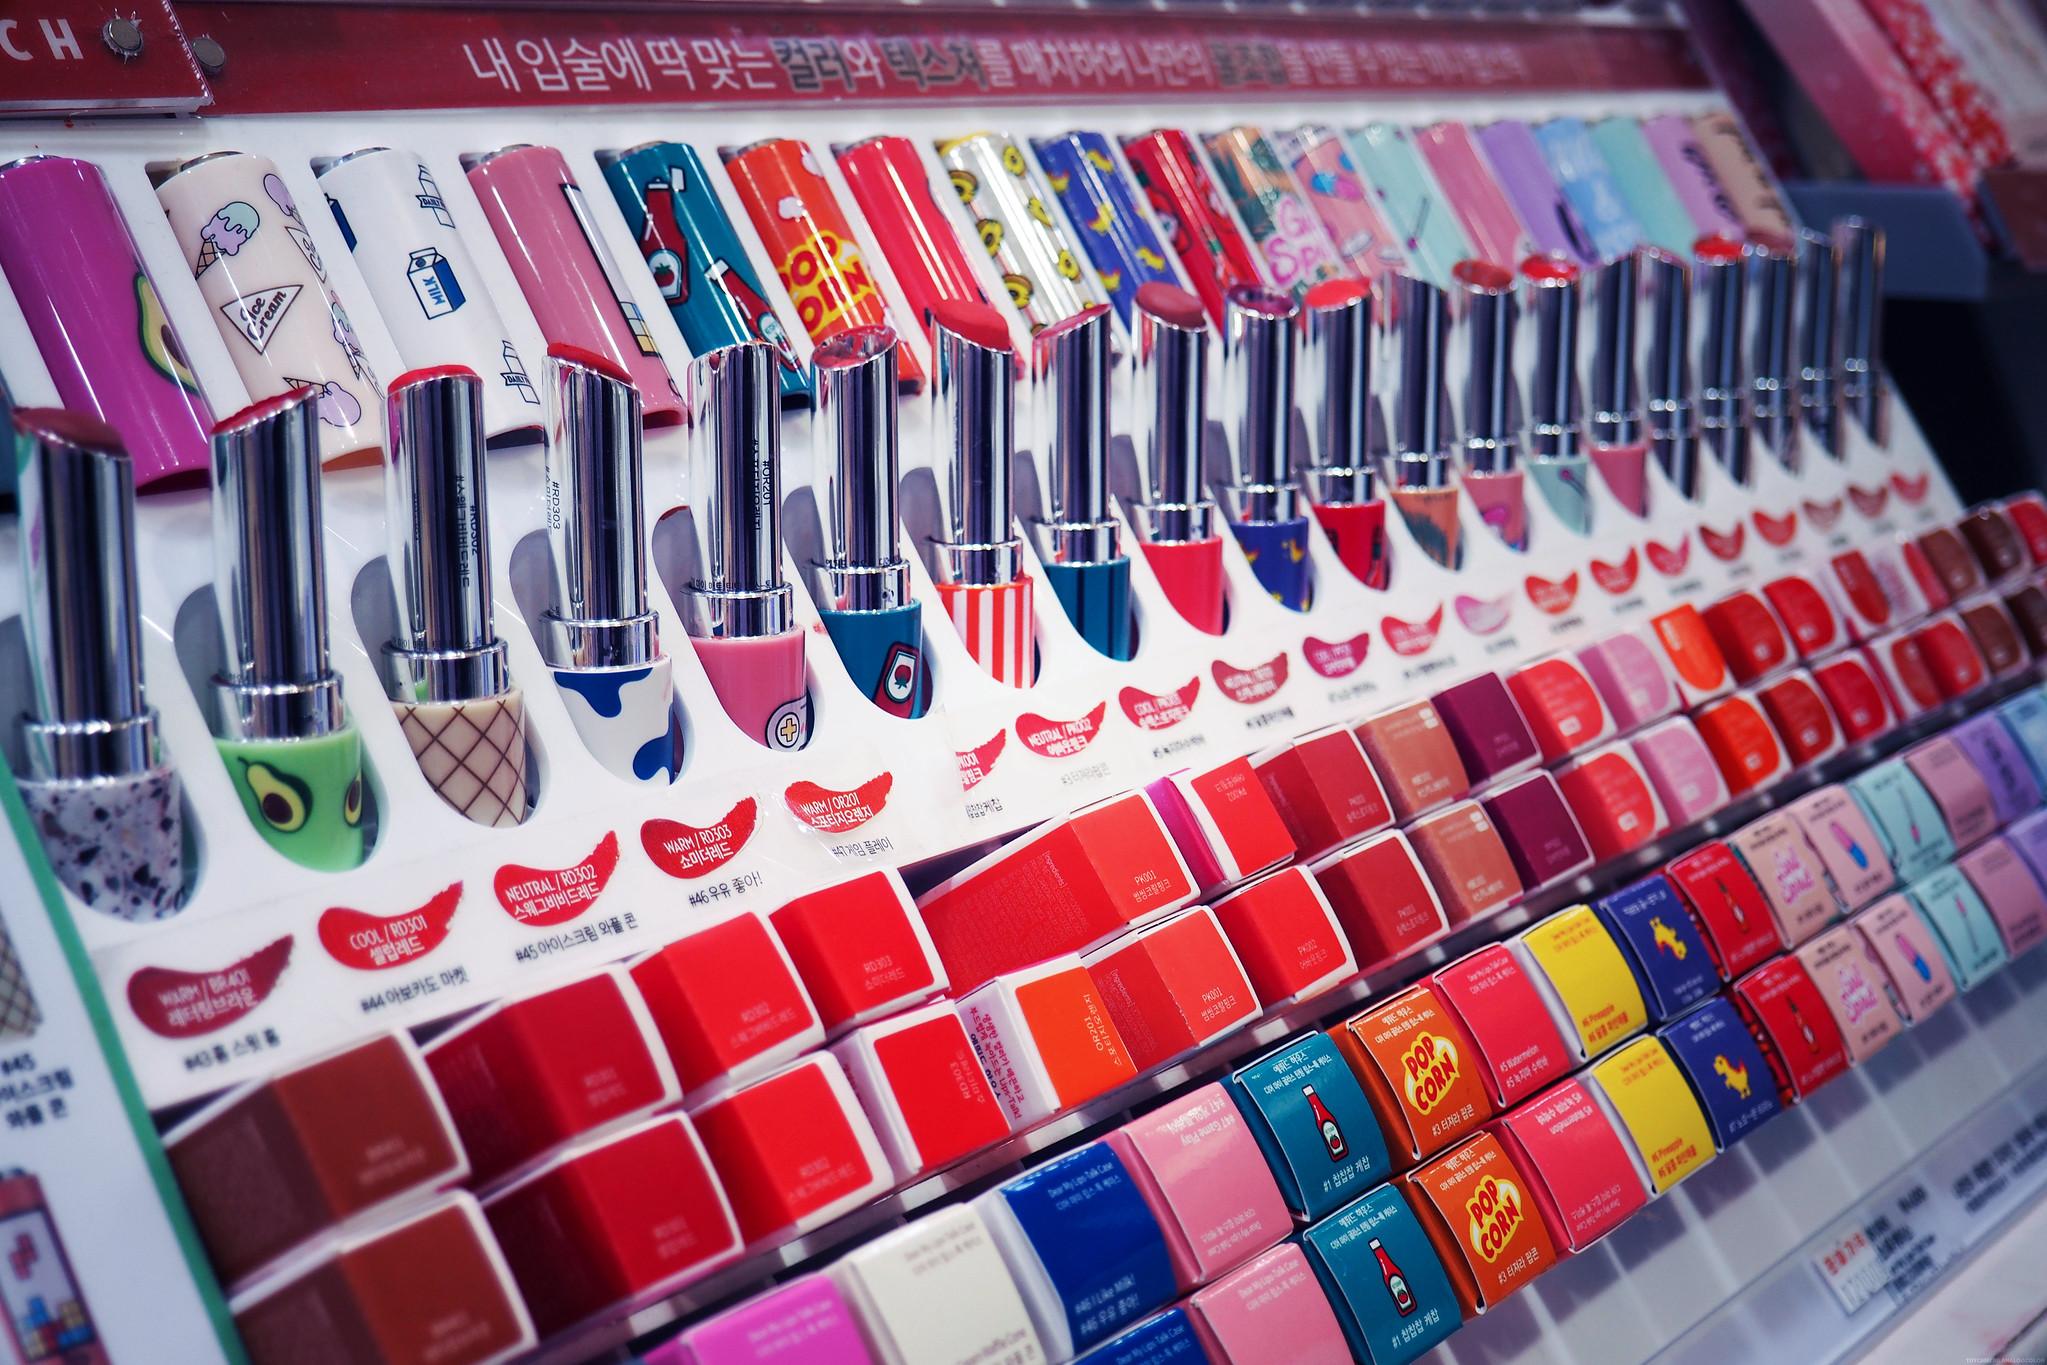 Etude House Lipsticks Cute Pastel Aesthetic _effected